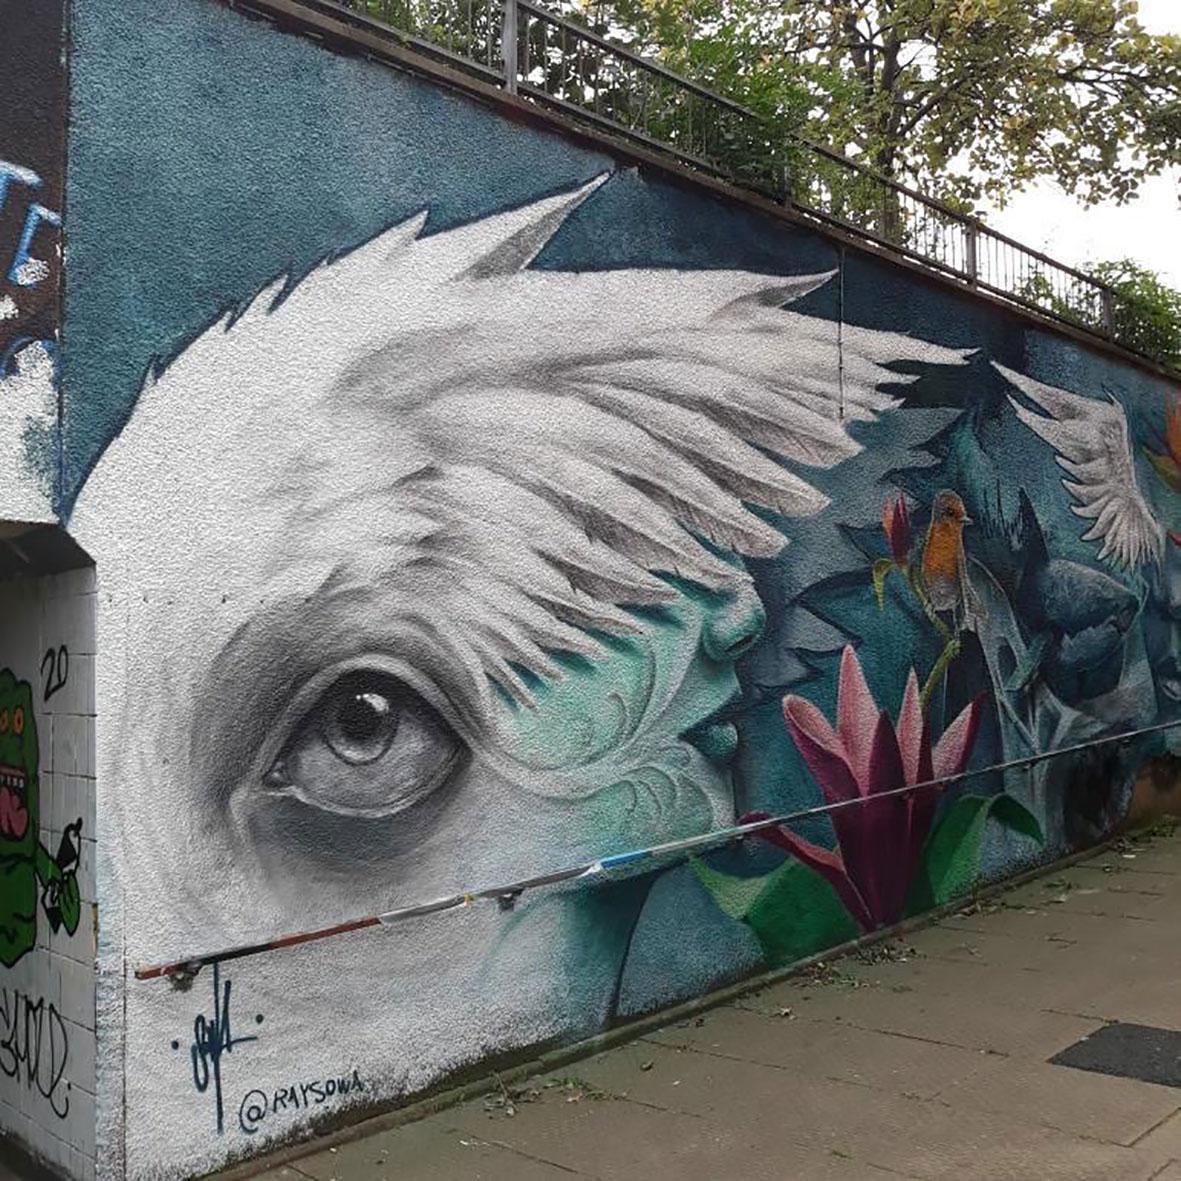 Street art in Northampton